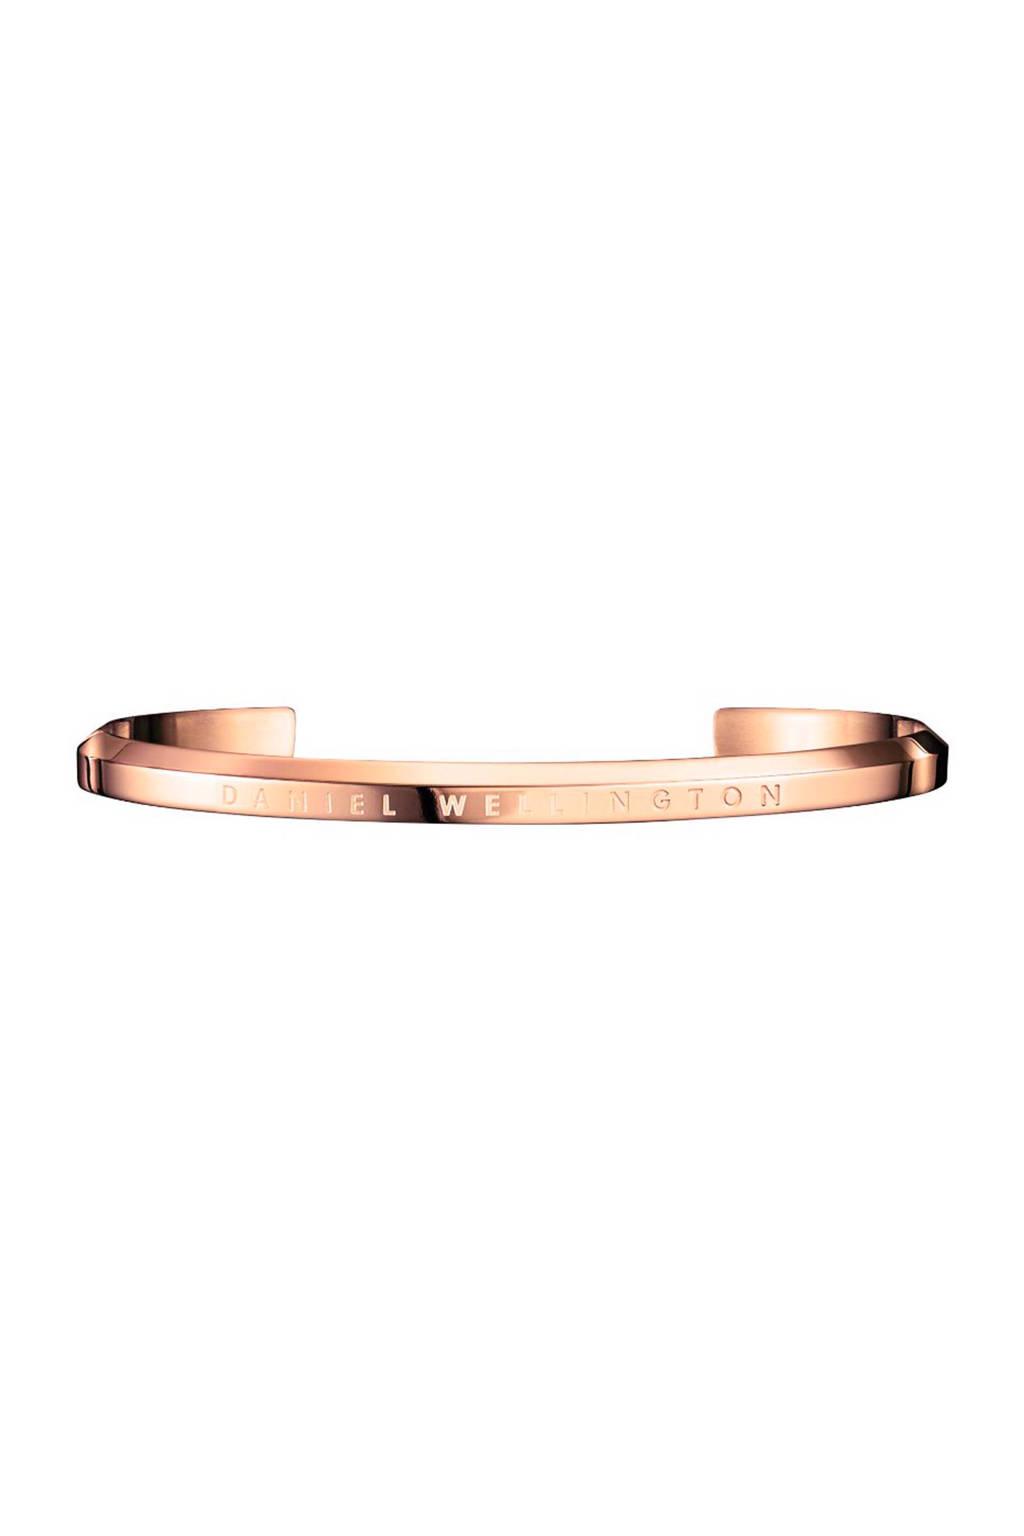 Daniel Wellington armband - DW00400001, rosegoud